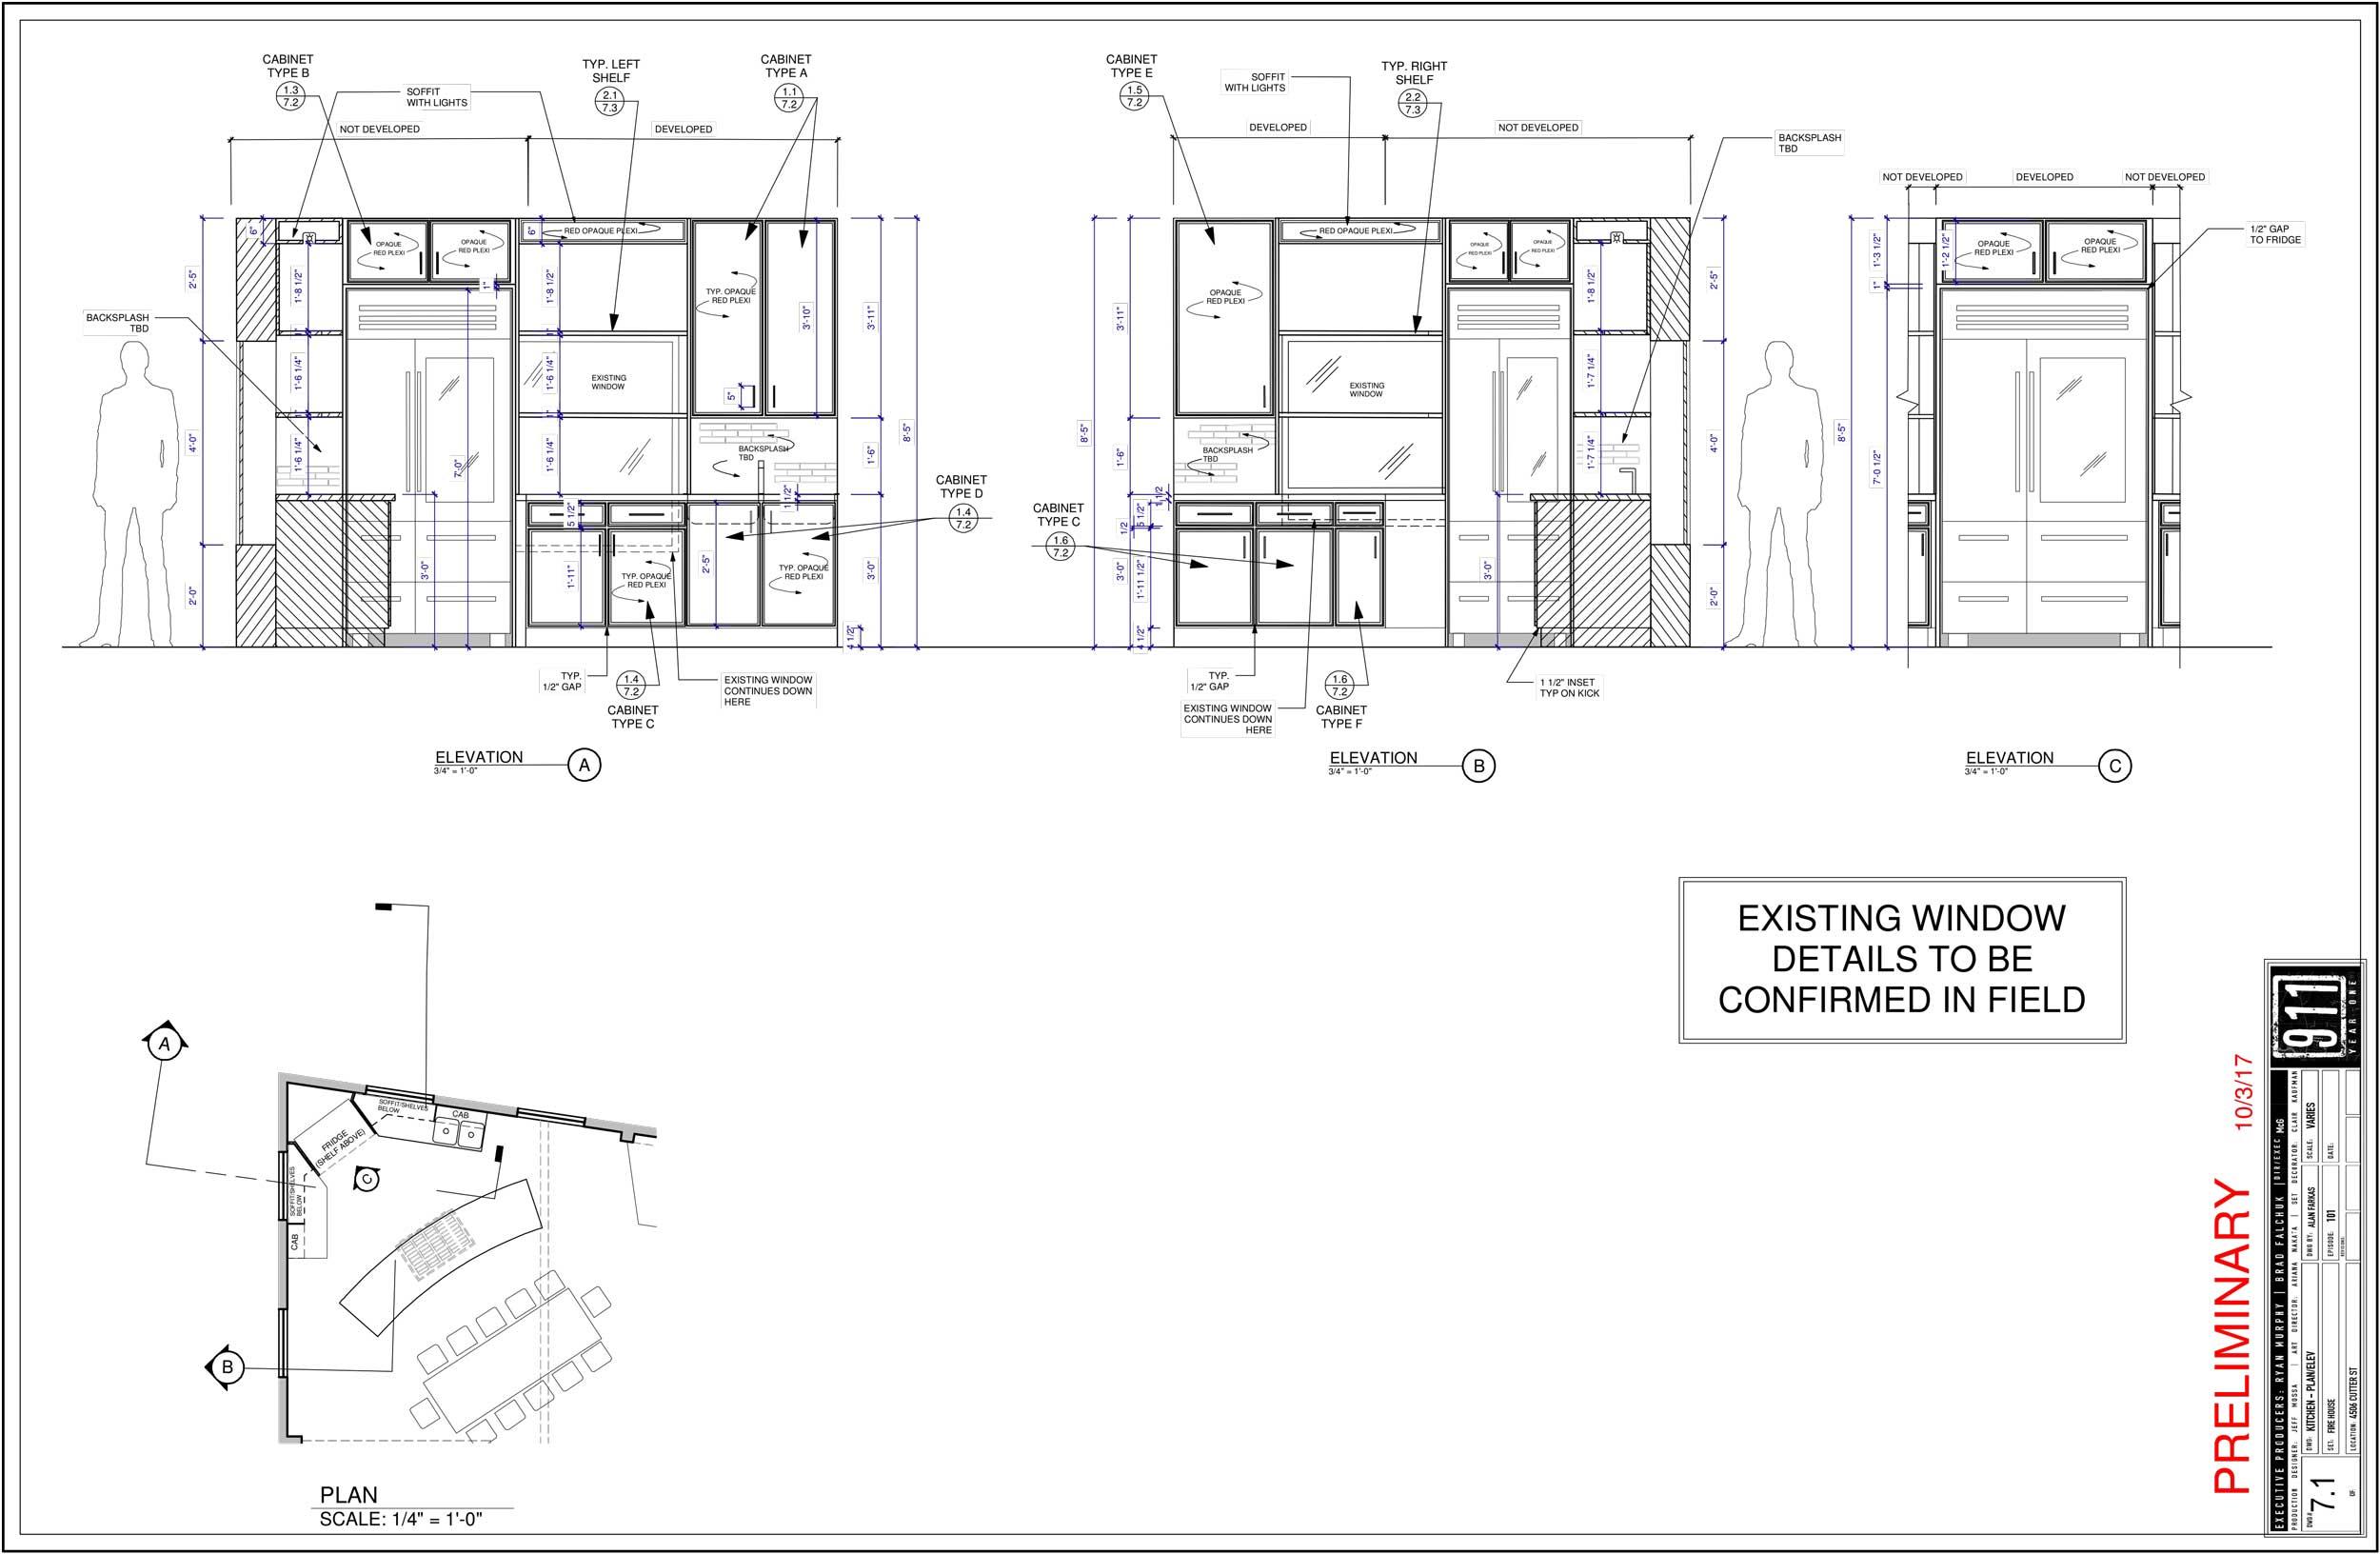 911_Firehouse_Kitchen-Elev_11x17.jpg